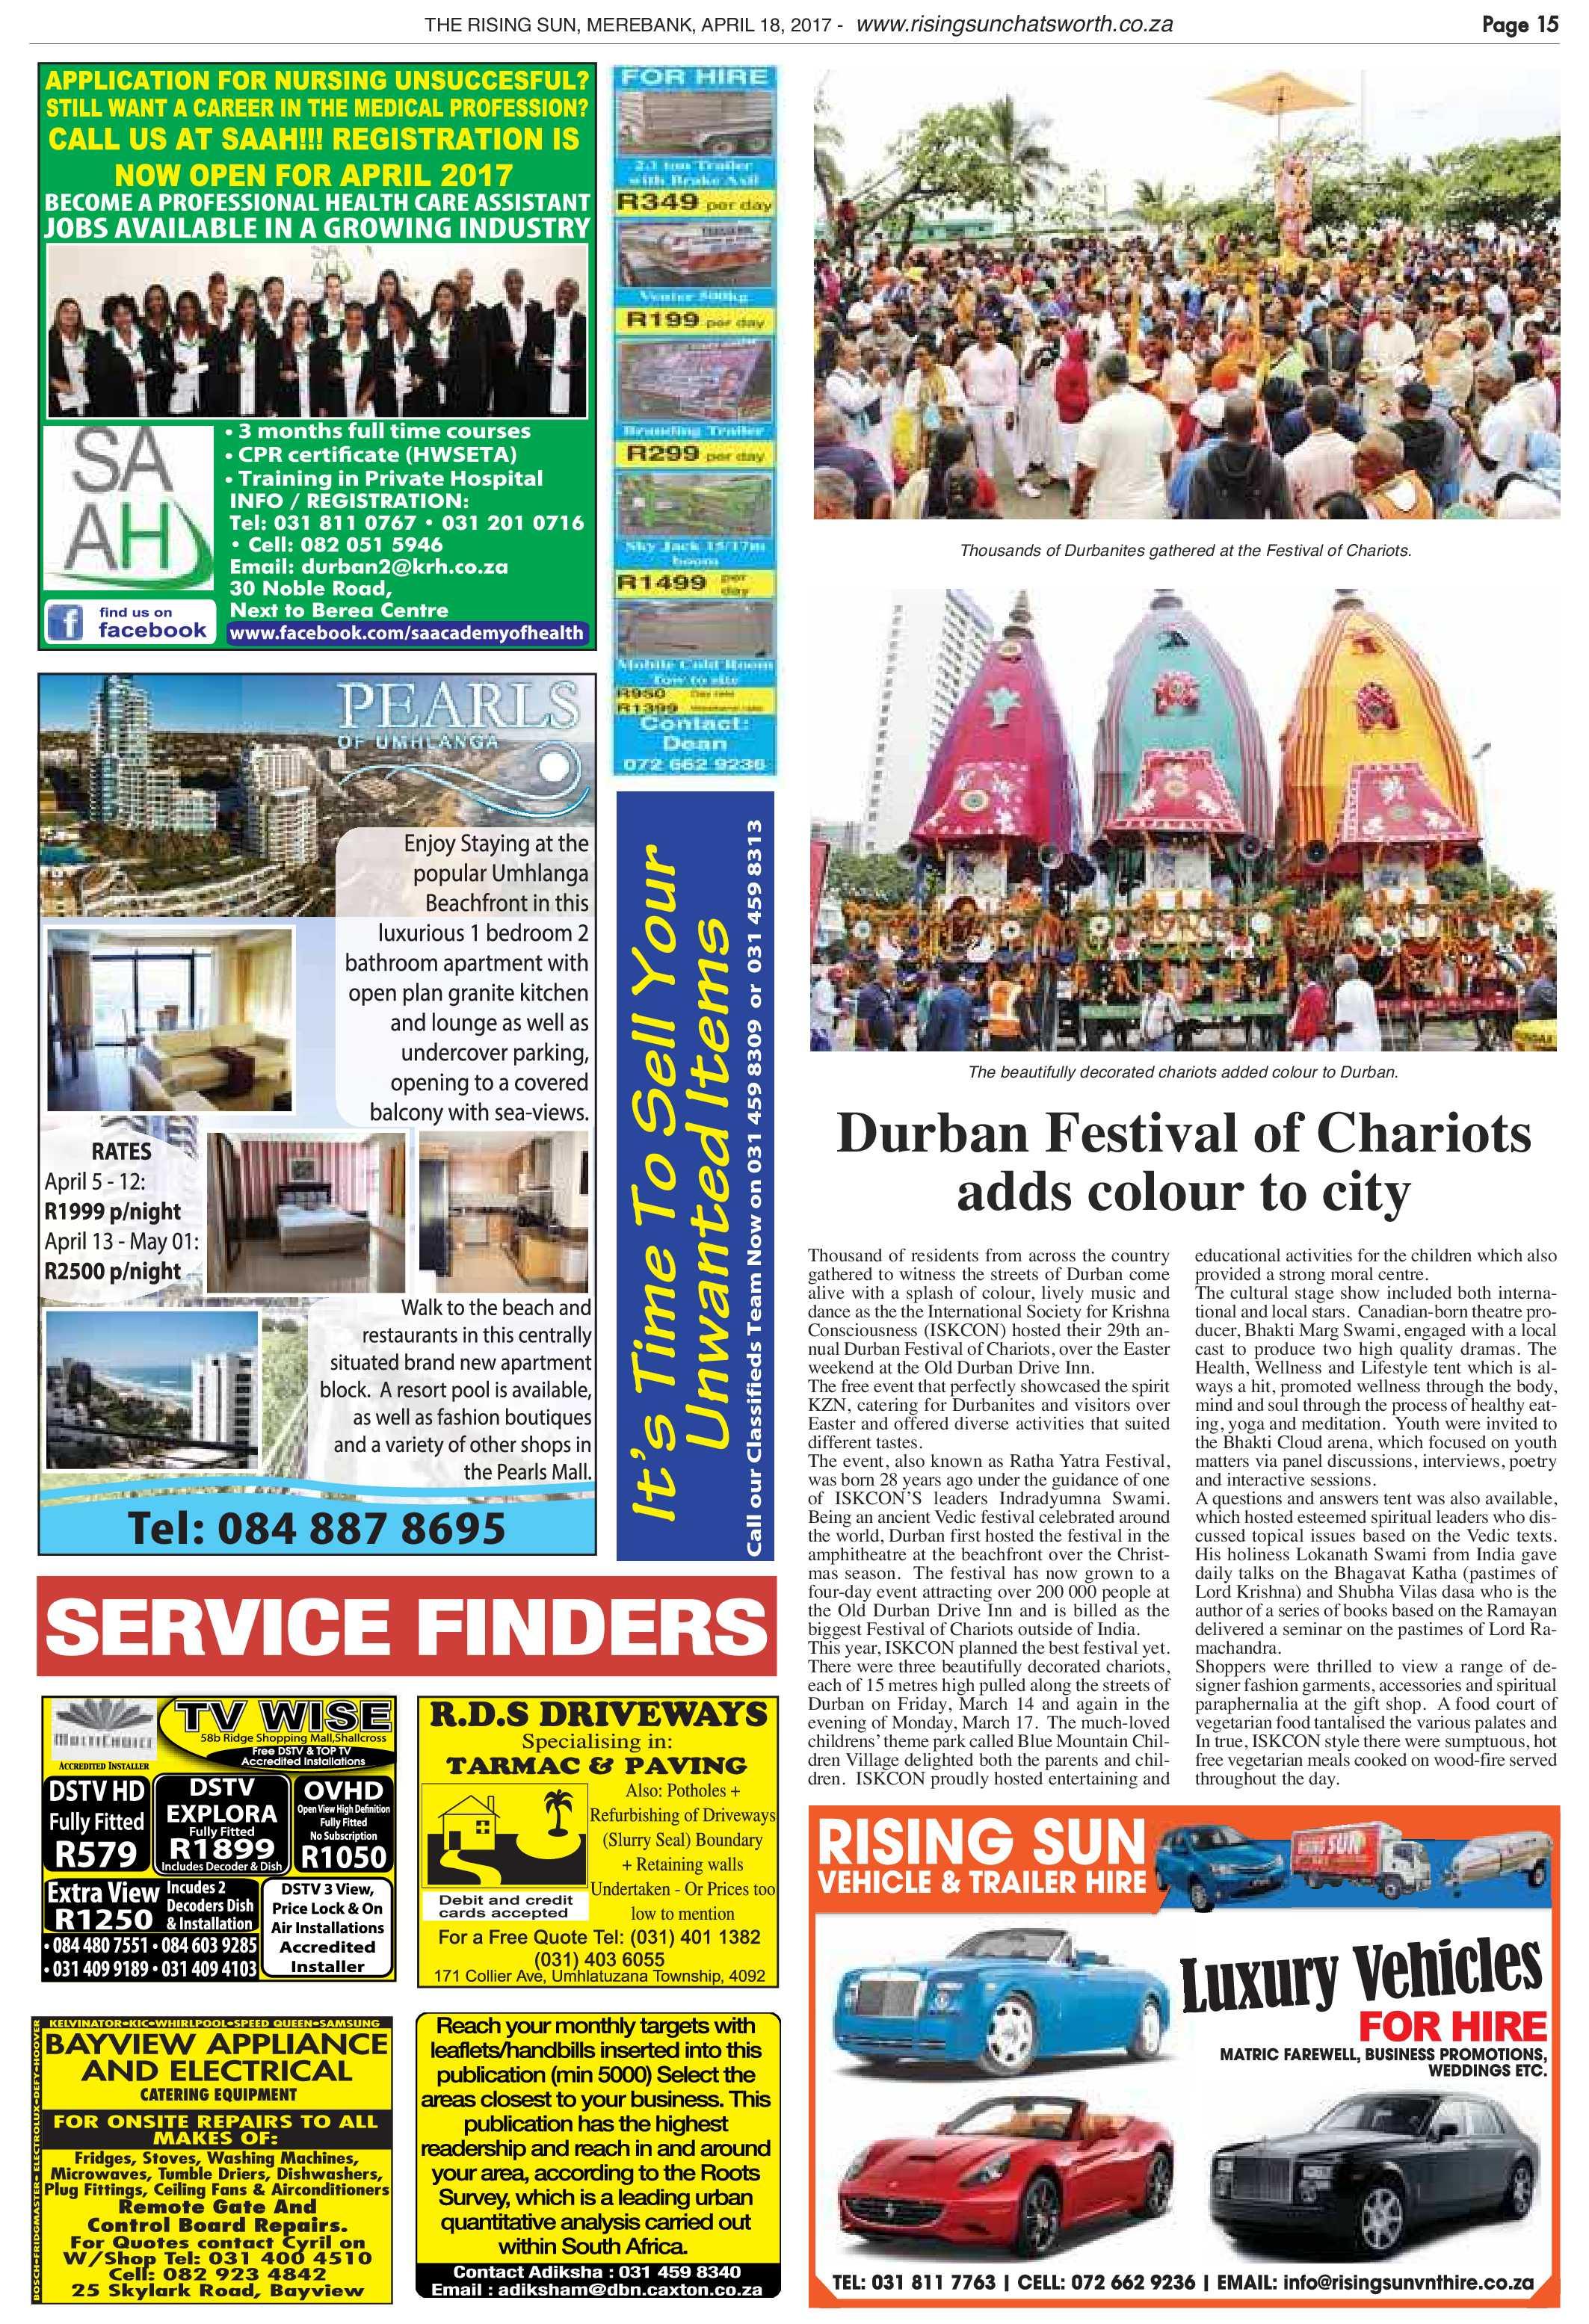 merebank-april-18-epapers-page-15